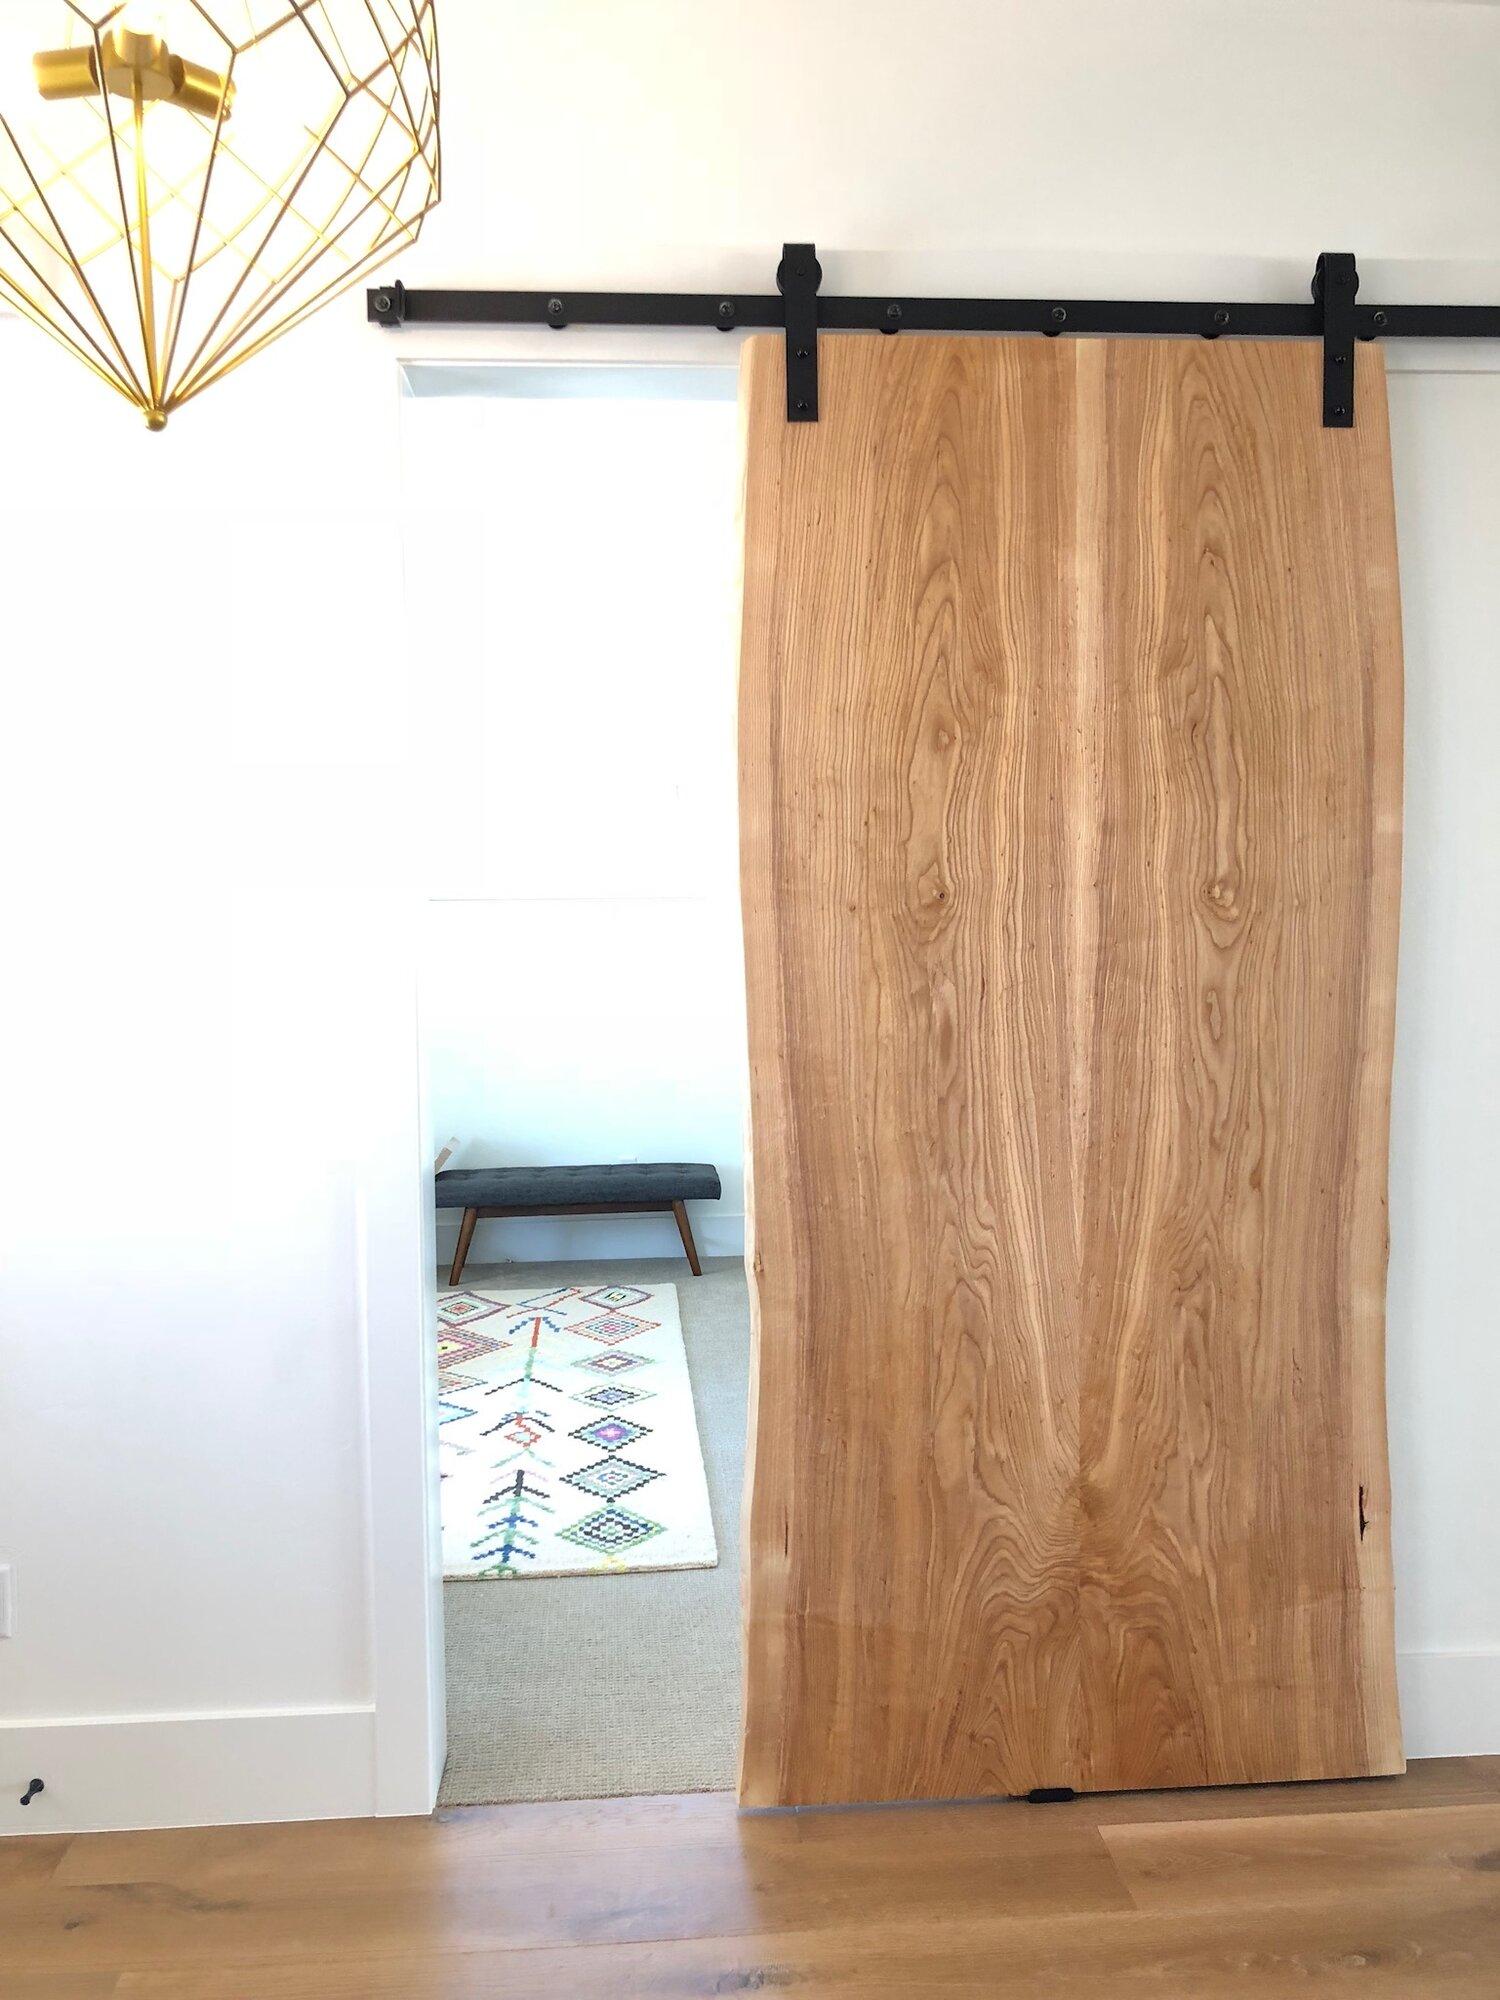 2915bf86e59 Sliding Barn Doors - Live Edge Wood Slabs - Walnut Ash Oak Guanacaste  Monkeypod — Stockton Heritage